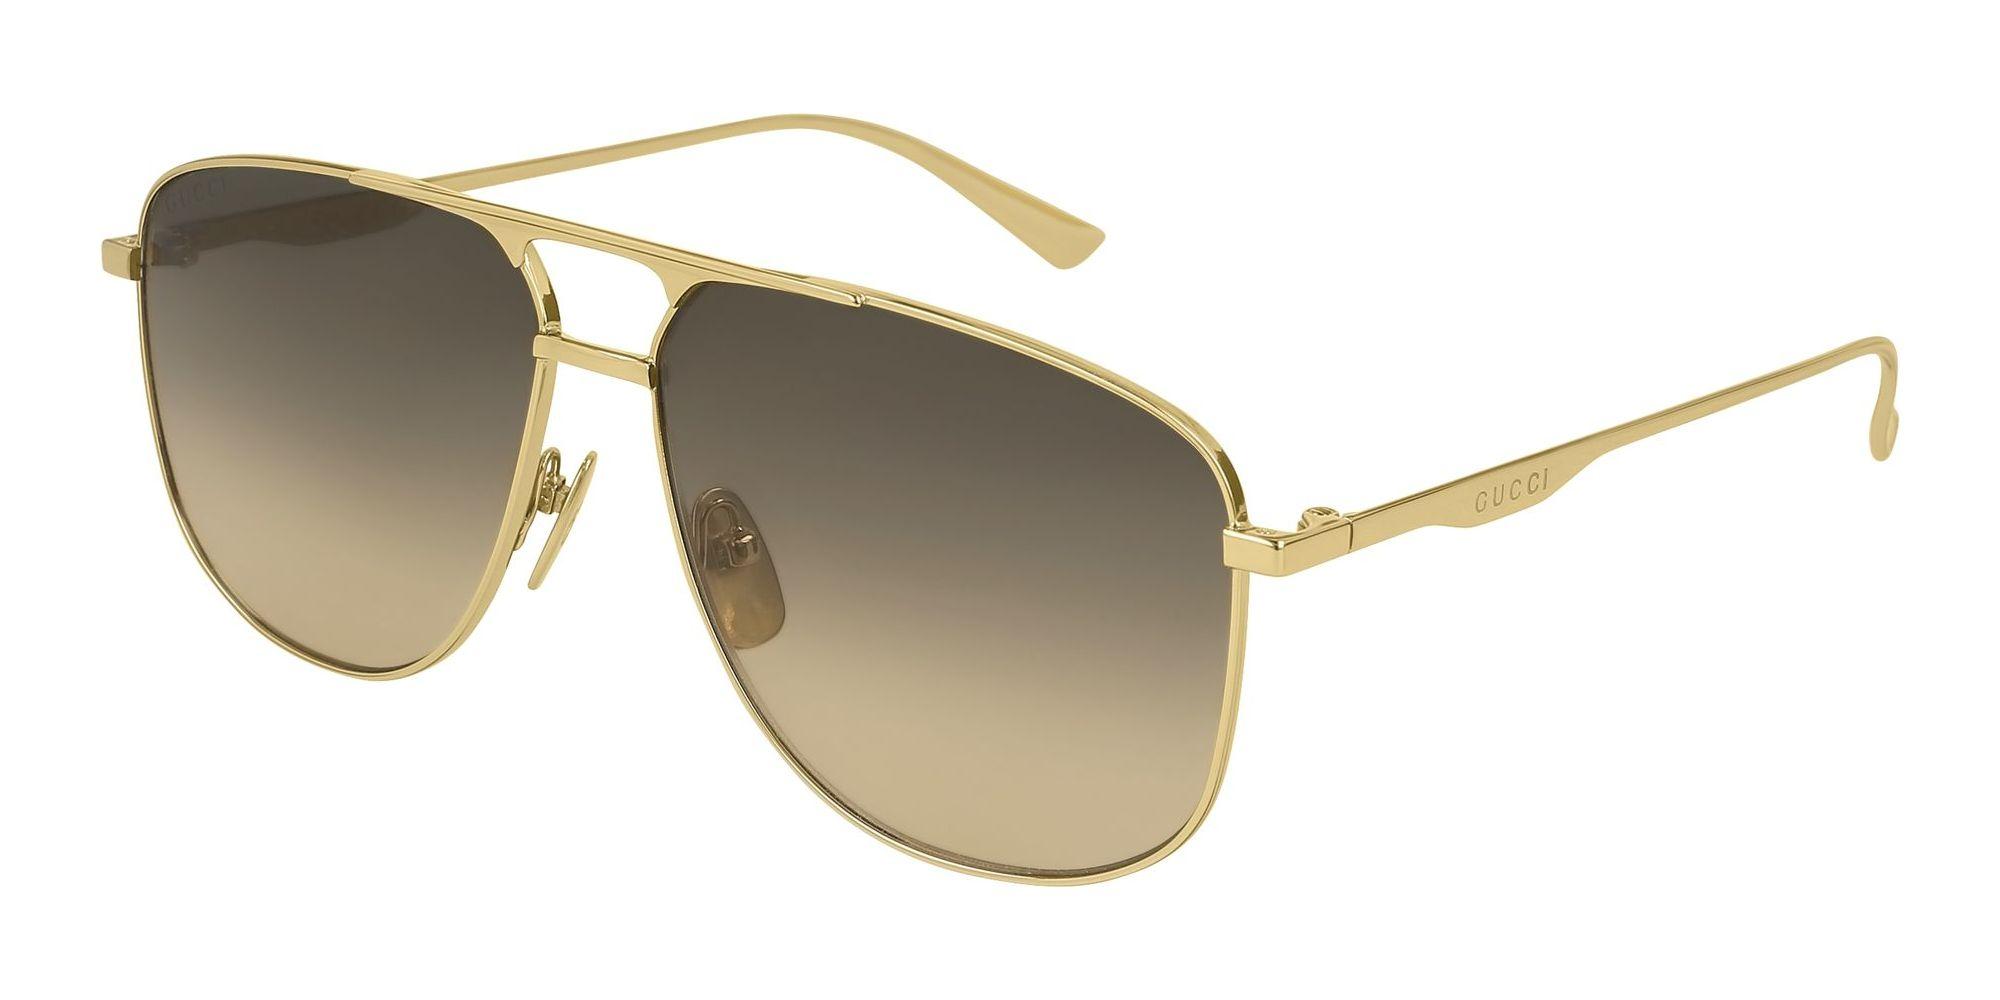 Gucci solbriller GG0336S